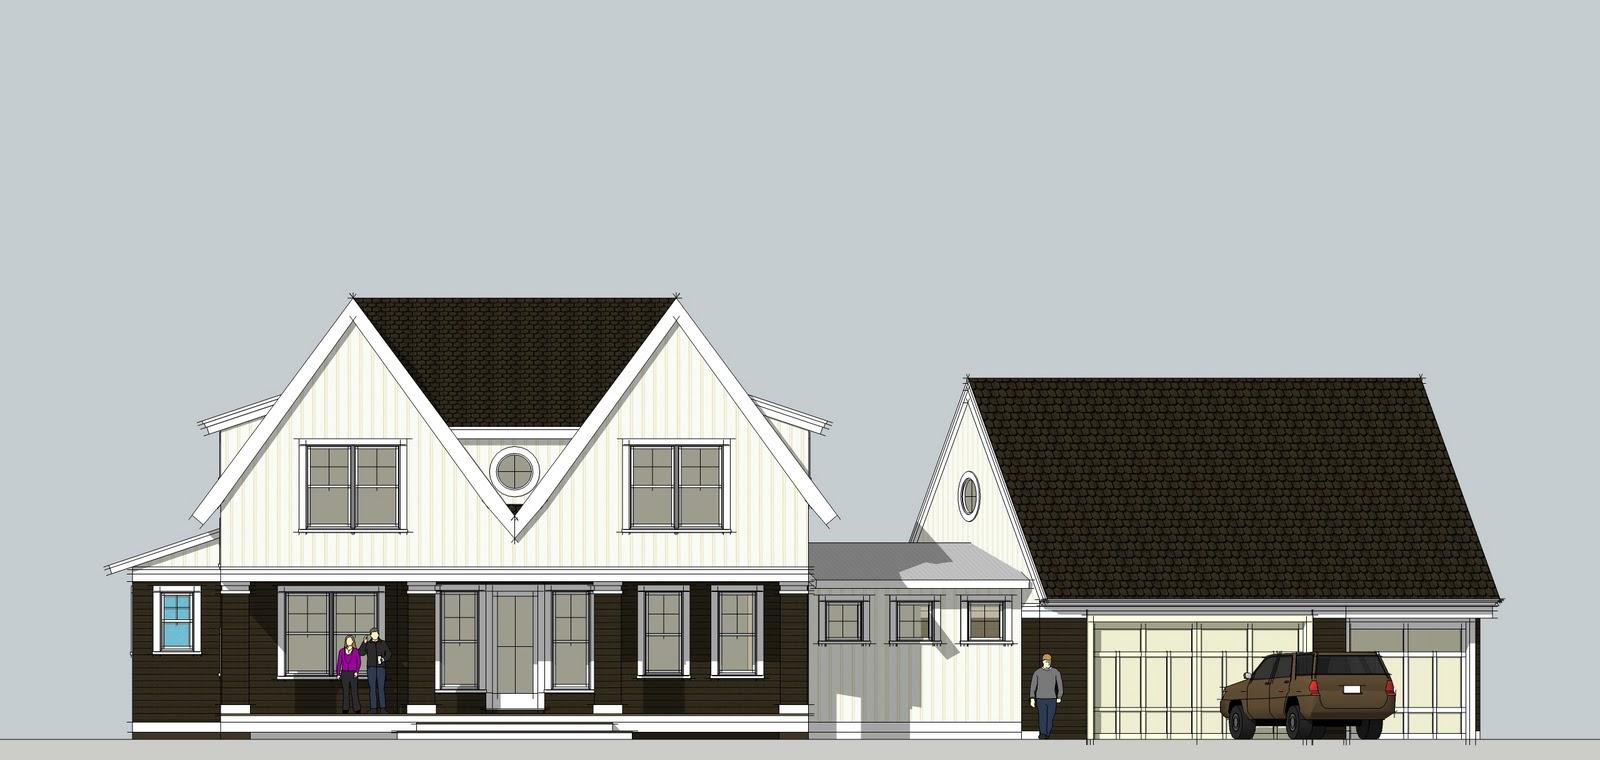 simply elegant home designs blog traditional yet contemporary home design. Black Bedroom Furniture Sets. Home Design Ideas